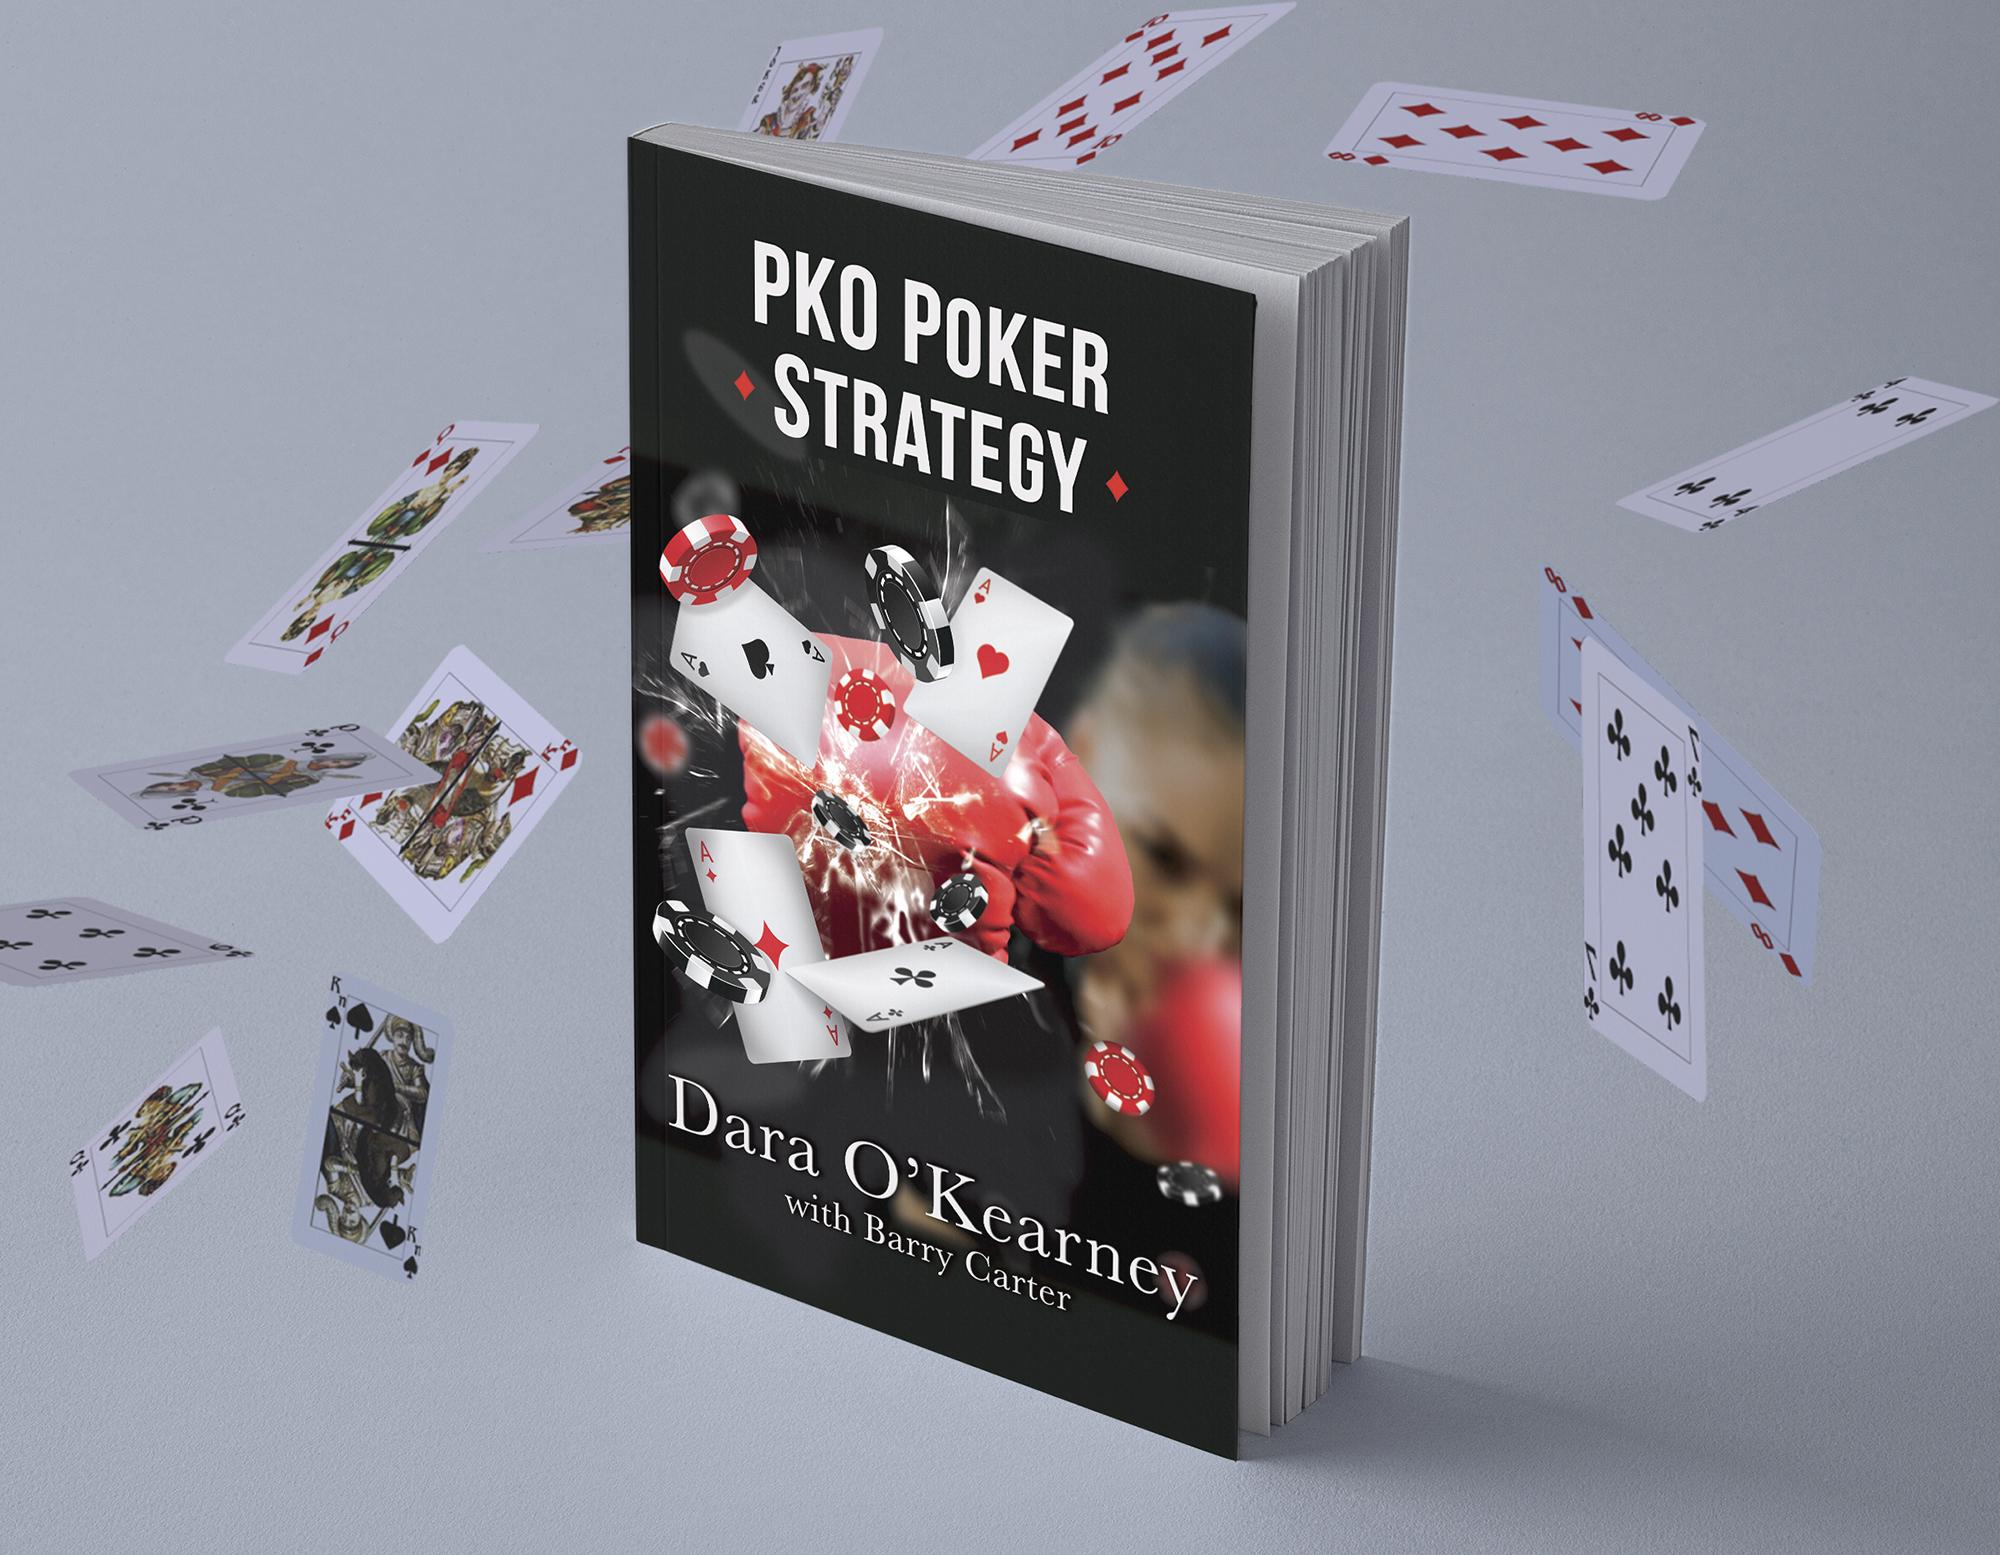 PKO Poker Strategy Dara O'Kearney and Barry Carter